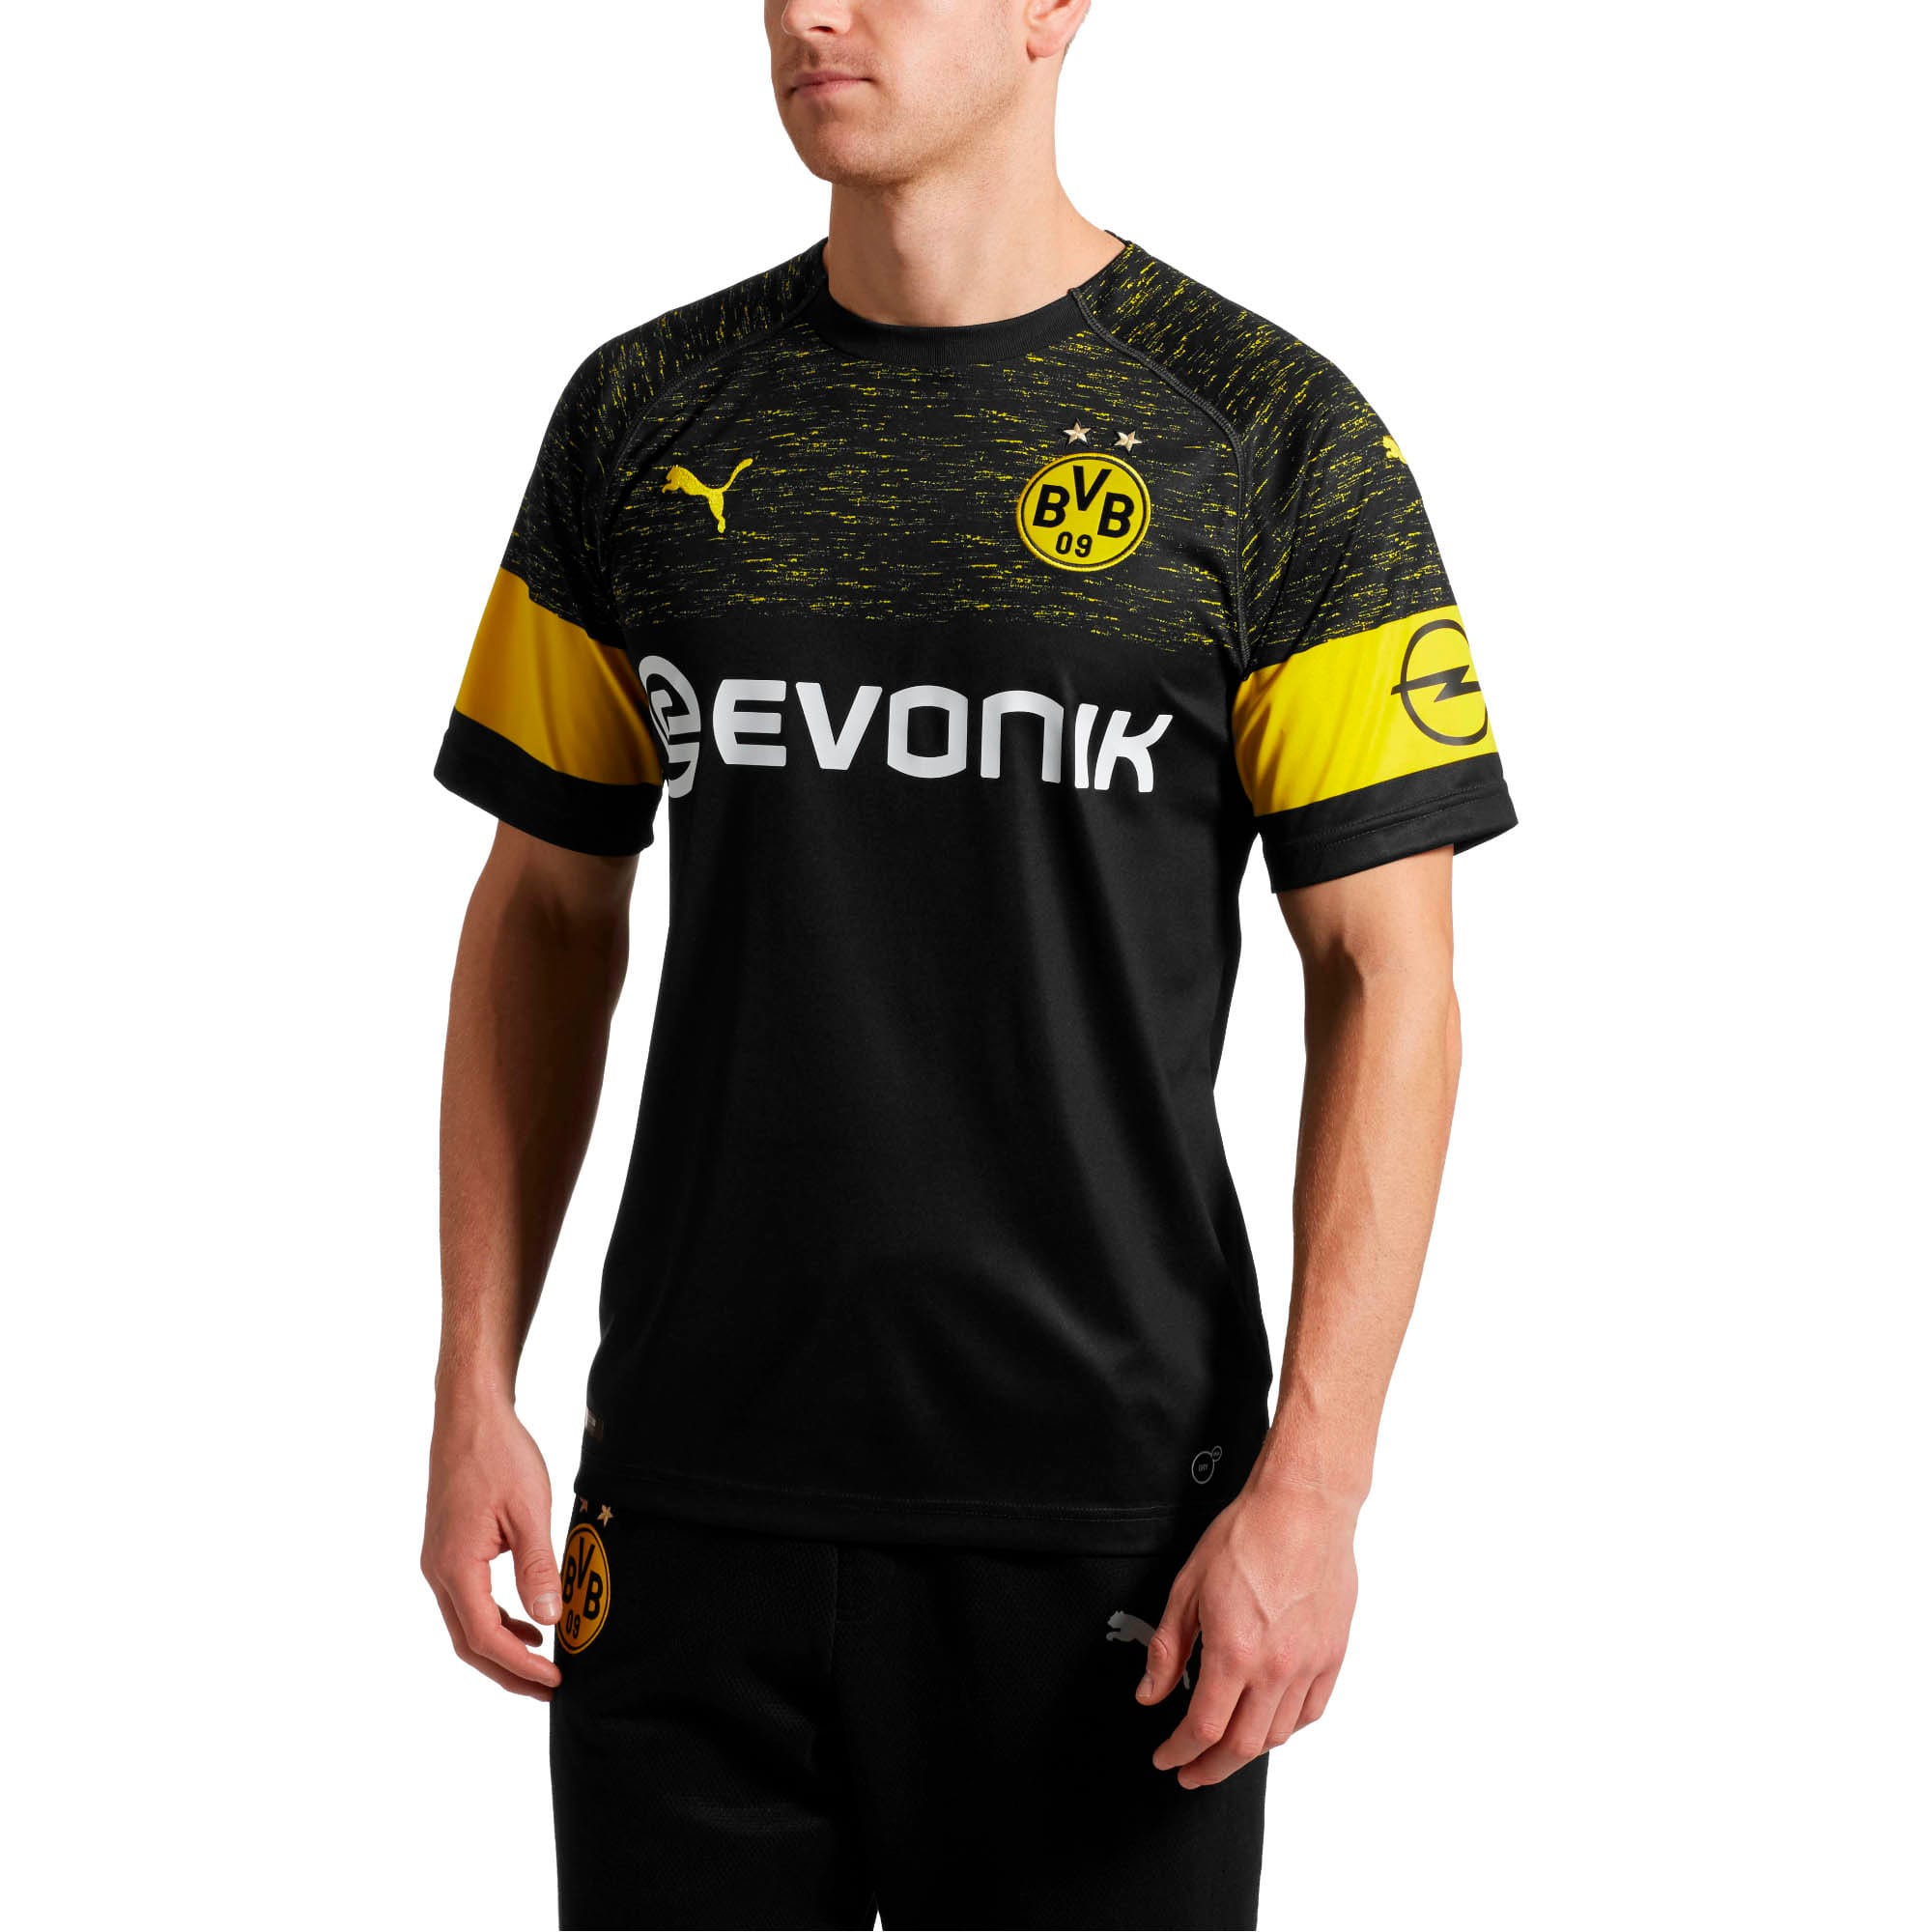 Thumbnail 1 of BVB Men's Replica Away Shirt, Puma Black, medium